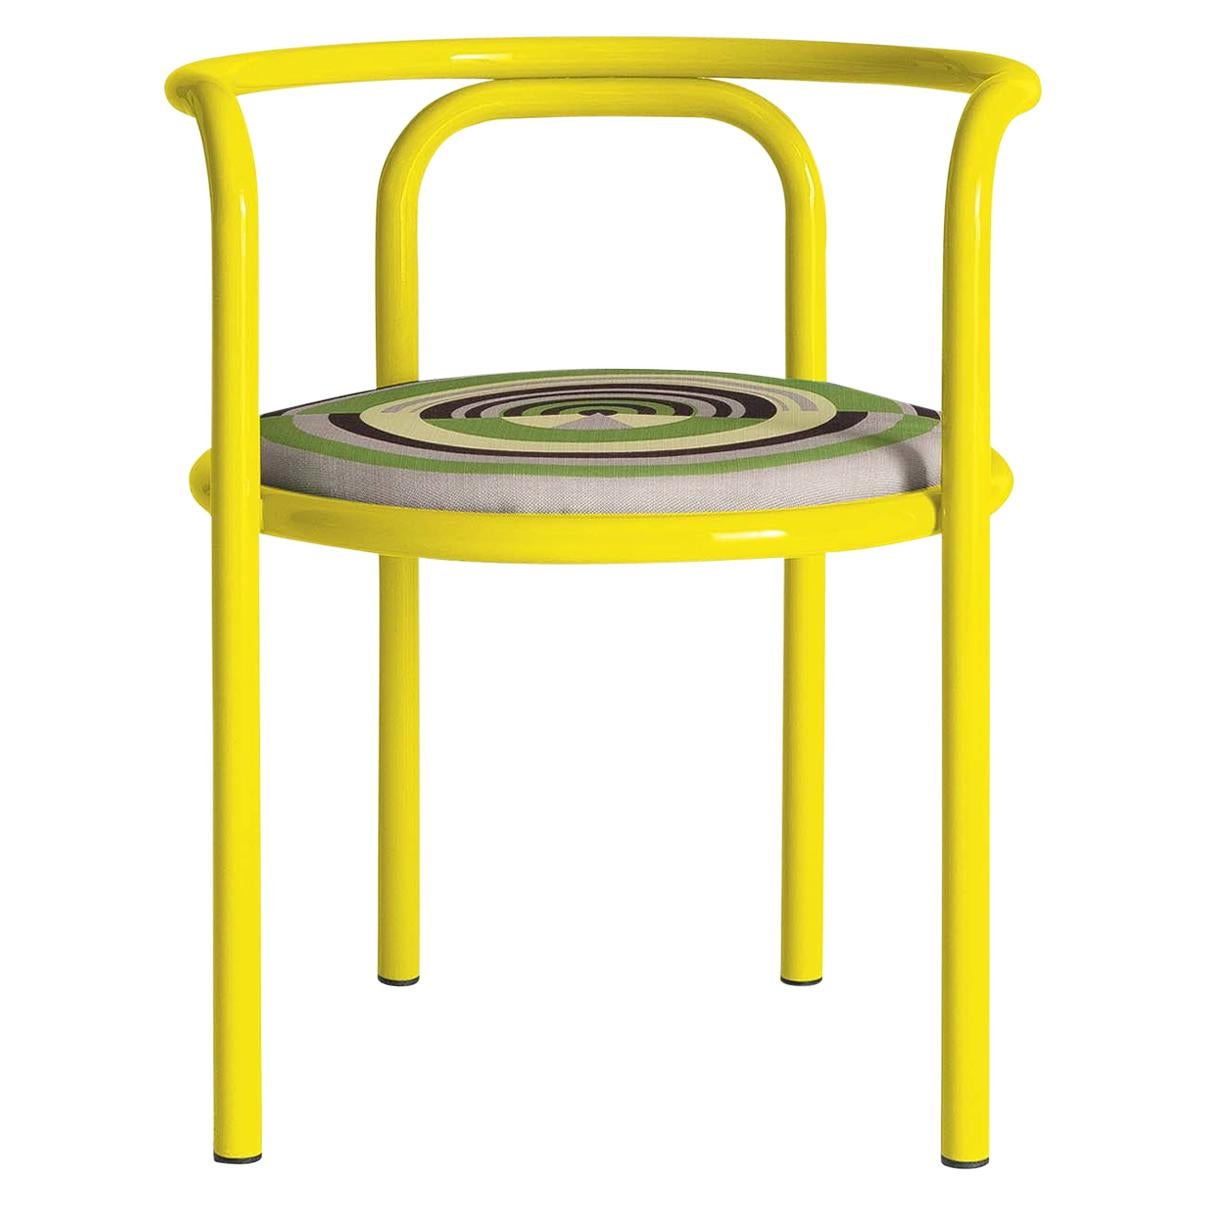 Locus Solus Yellow Chair by Gae Aulenti